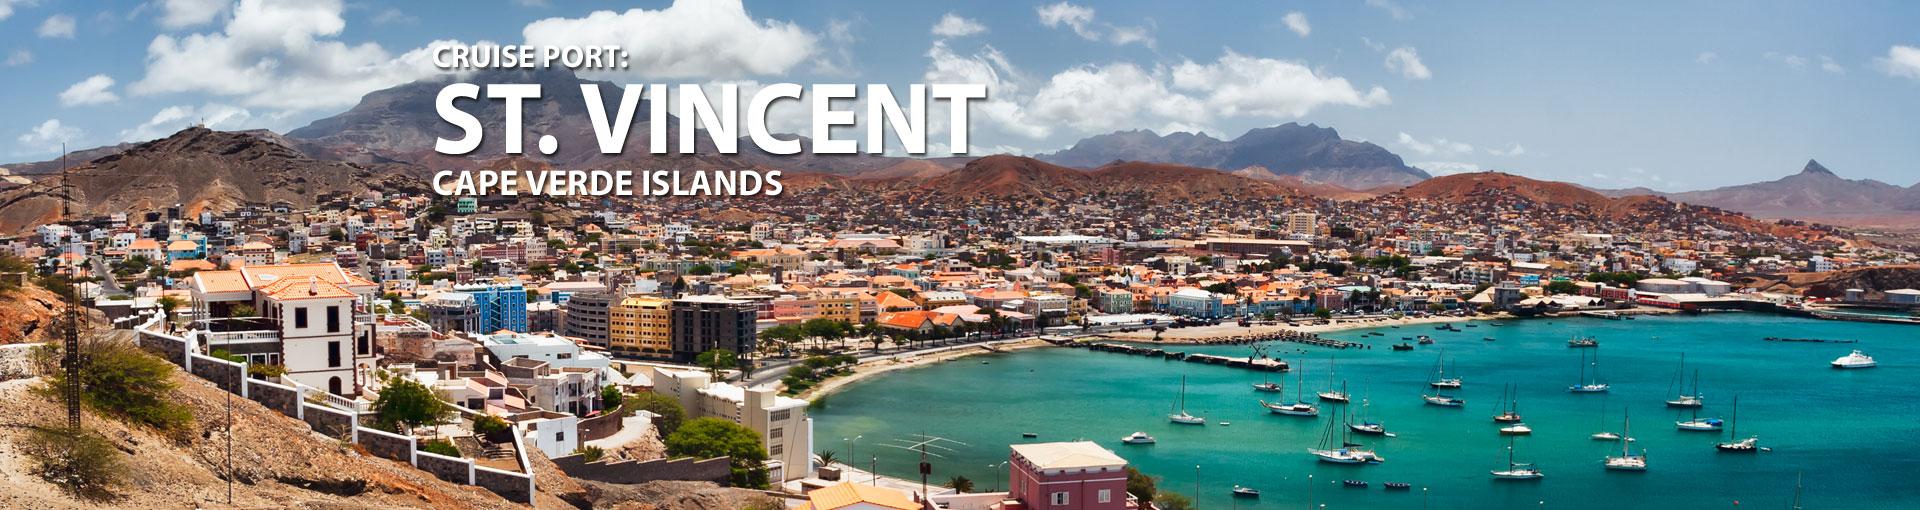 Cruises to St. Vincent, Cape Verde Islands